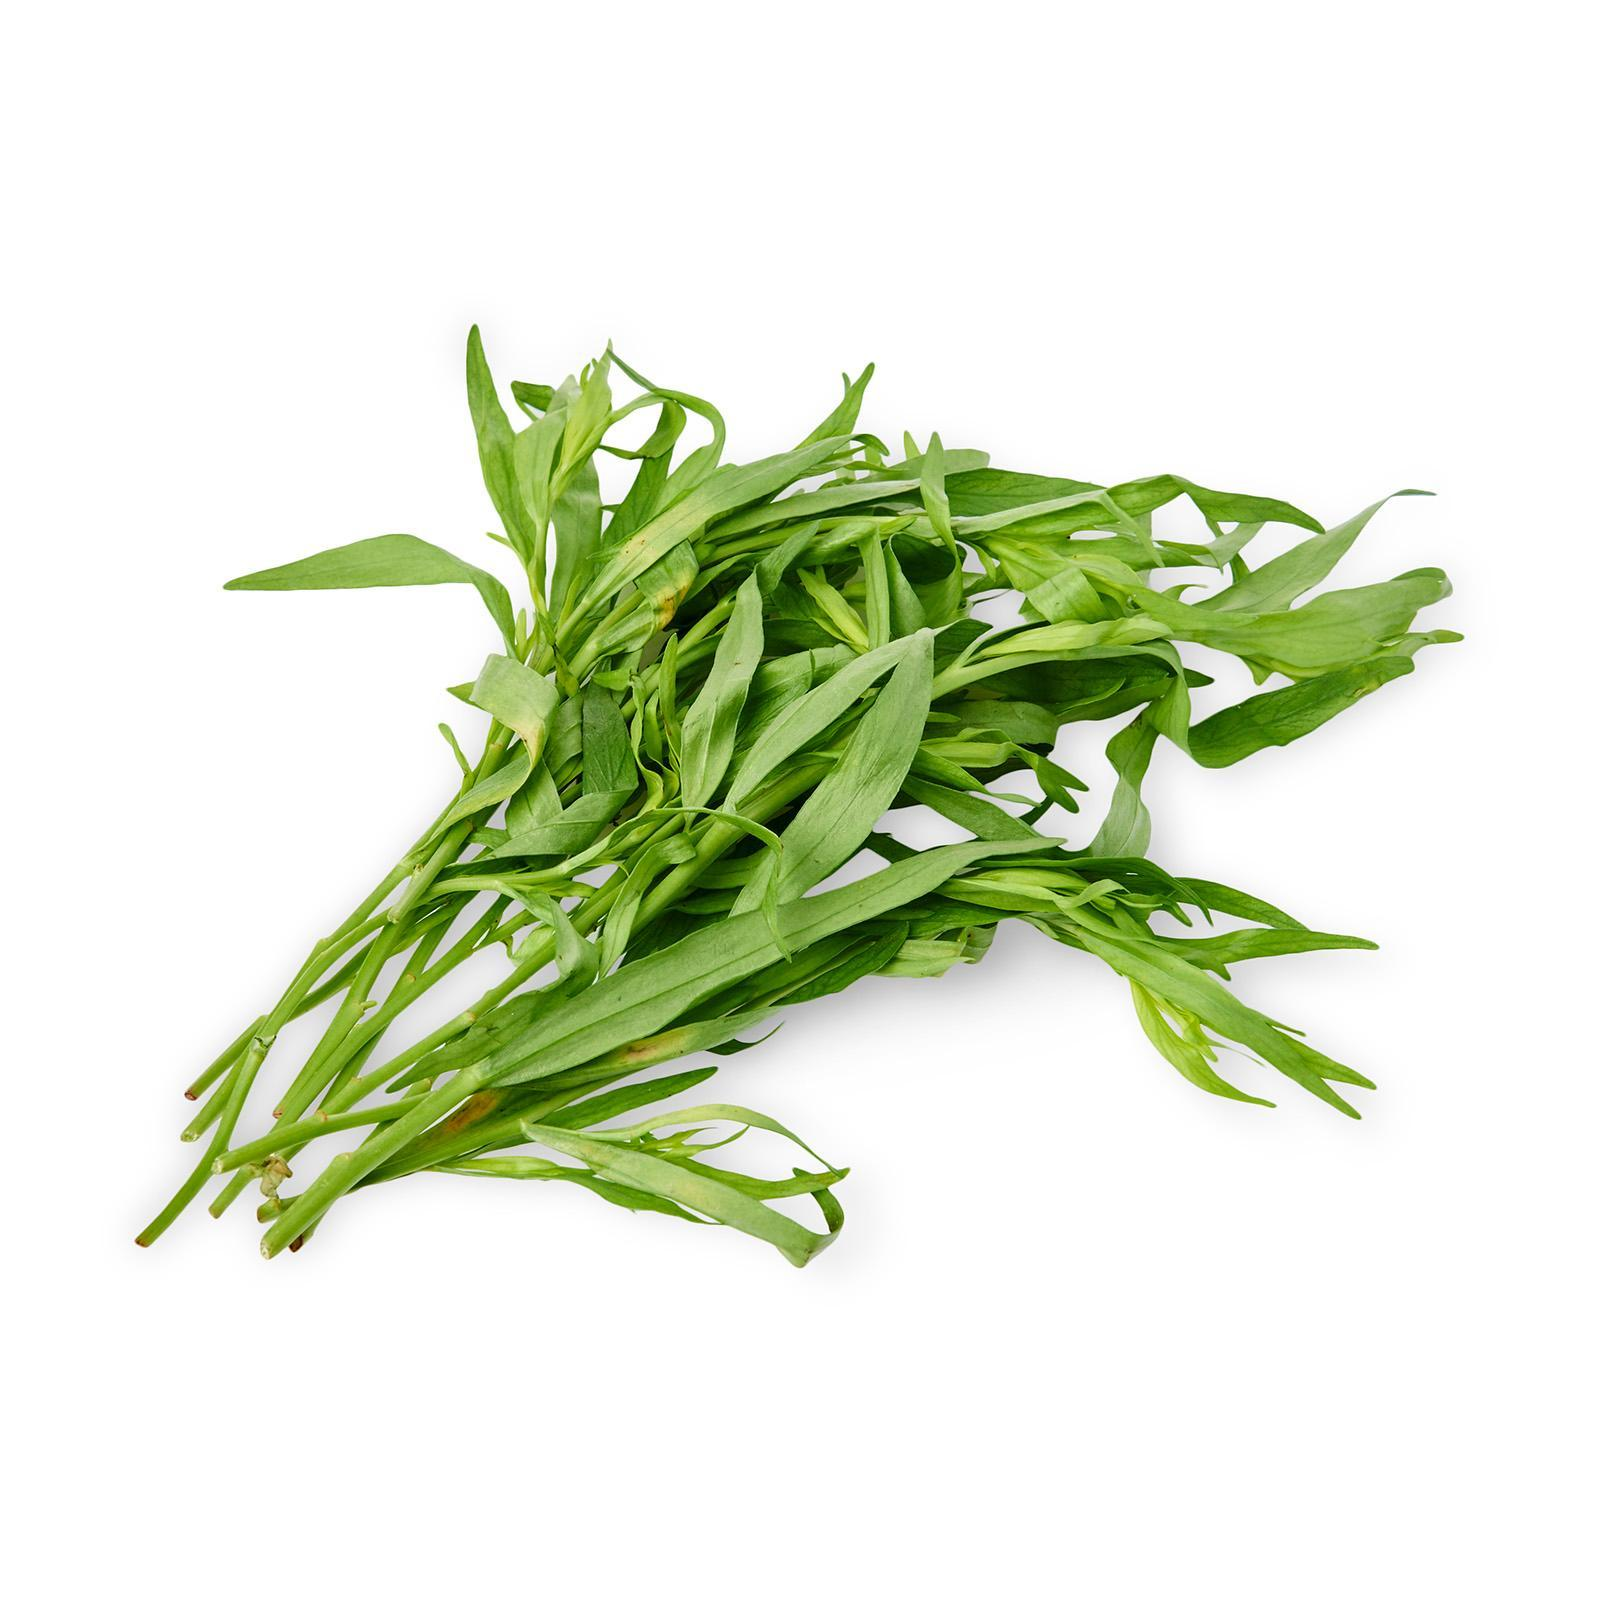 Live Well Tarragon Fresh Herbs